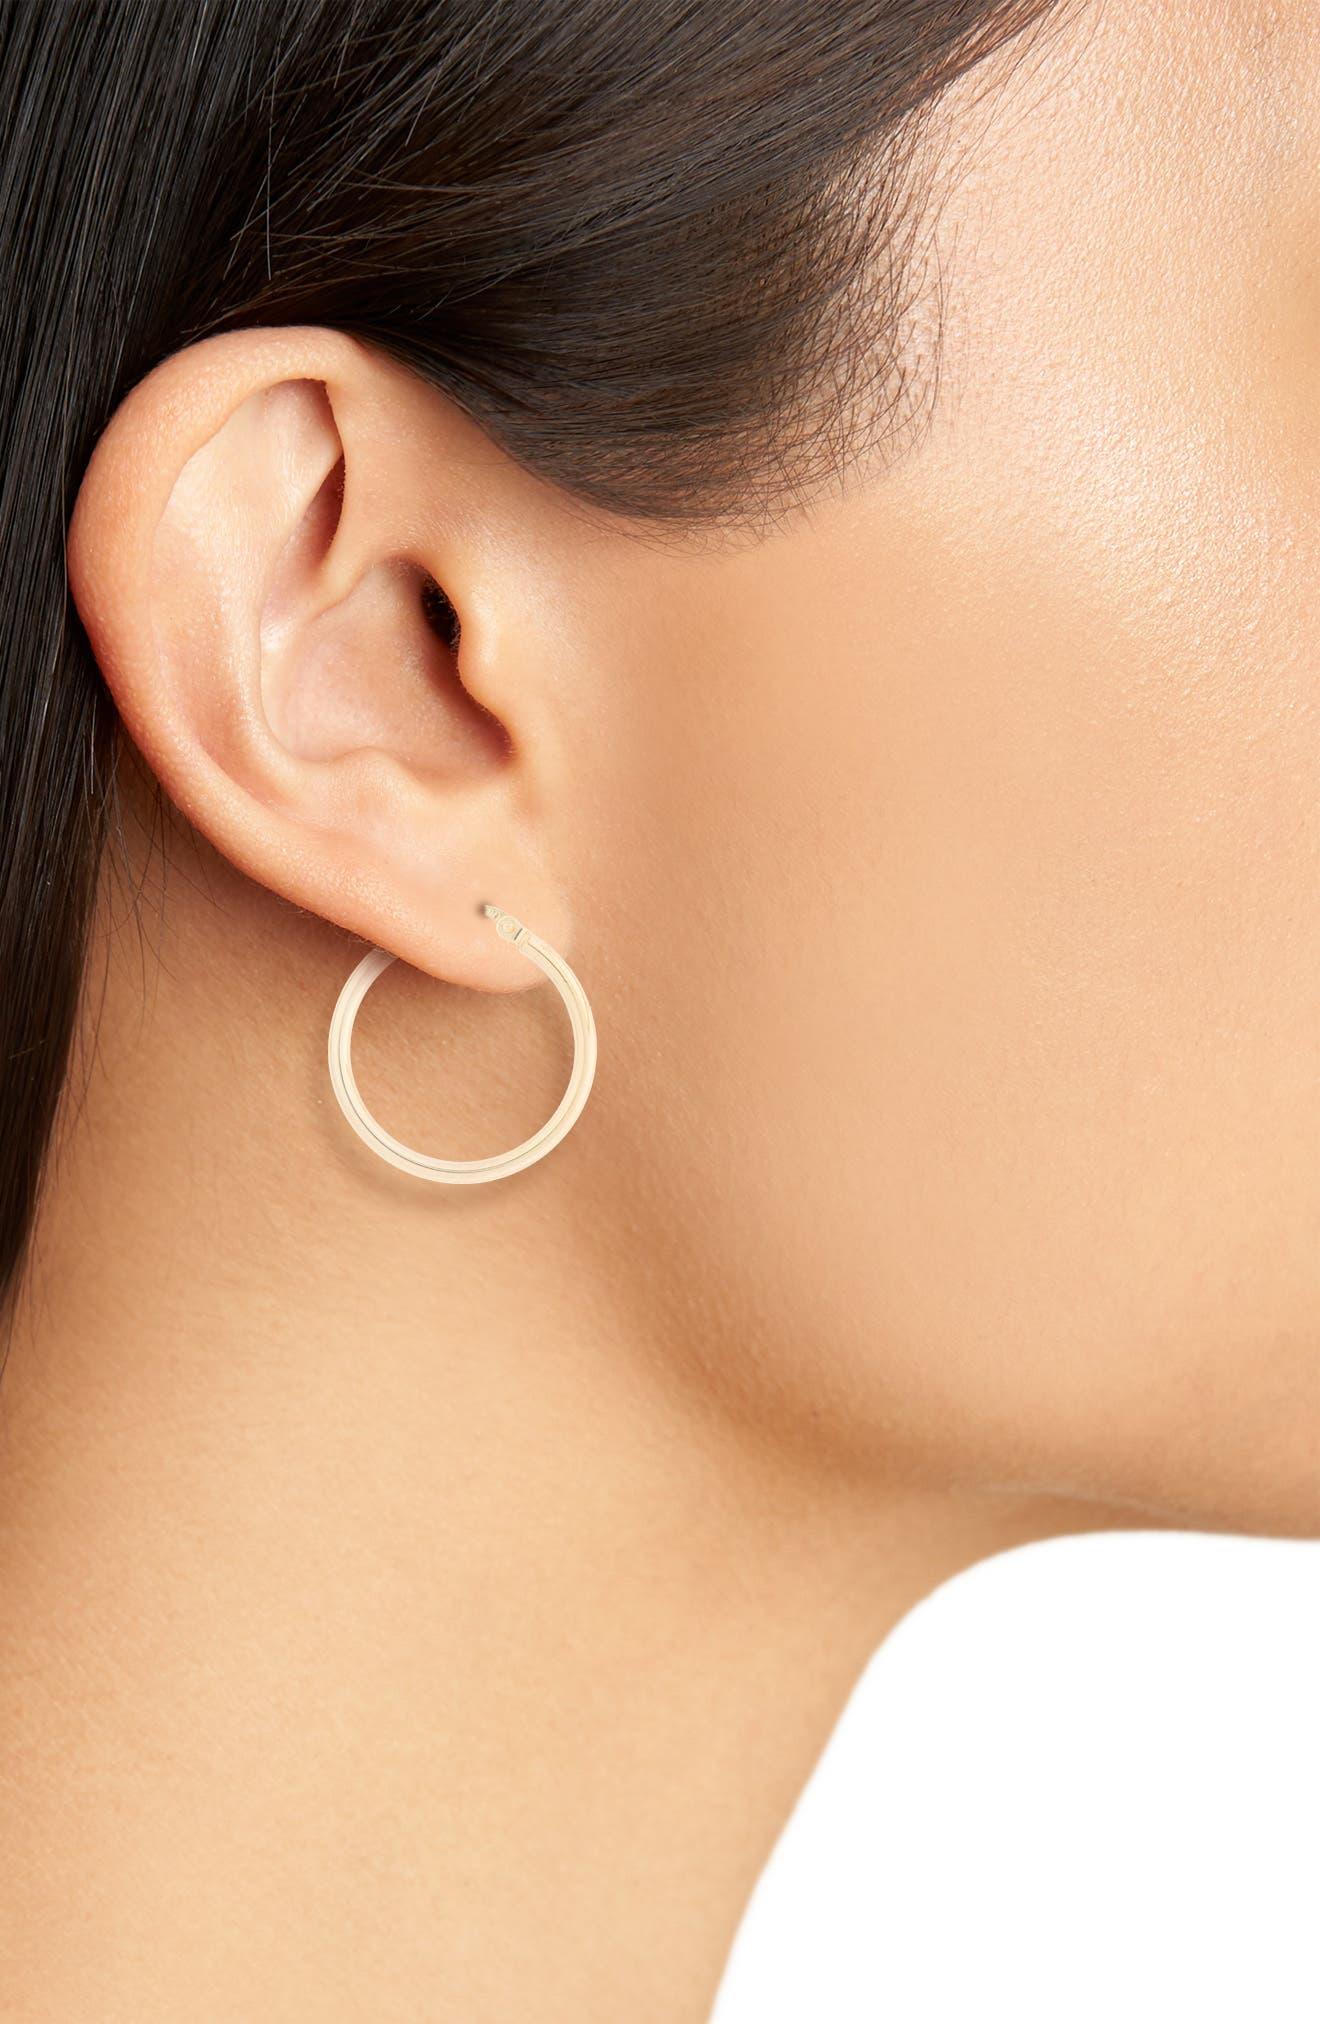 14k Gold Hoop Earrings,                             Alternate thumbnail 3, color,                             YELLOW GOLD